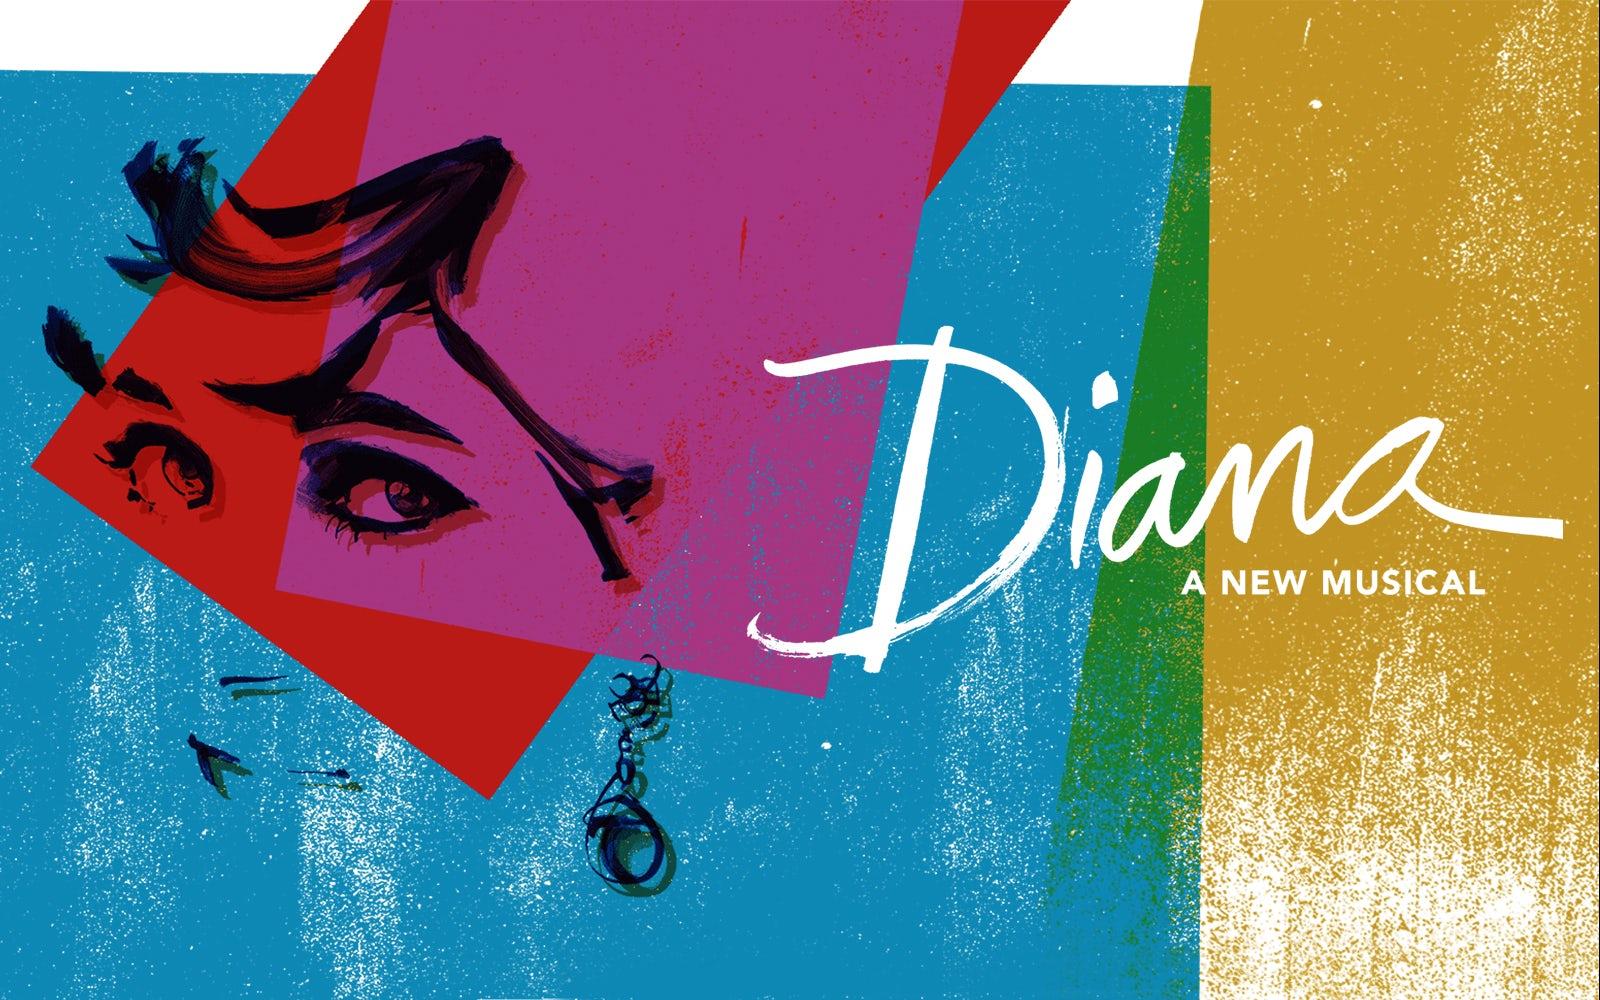 Upcoming broadway shows 2020 - Diana